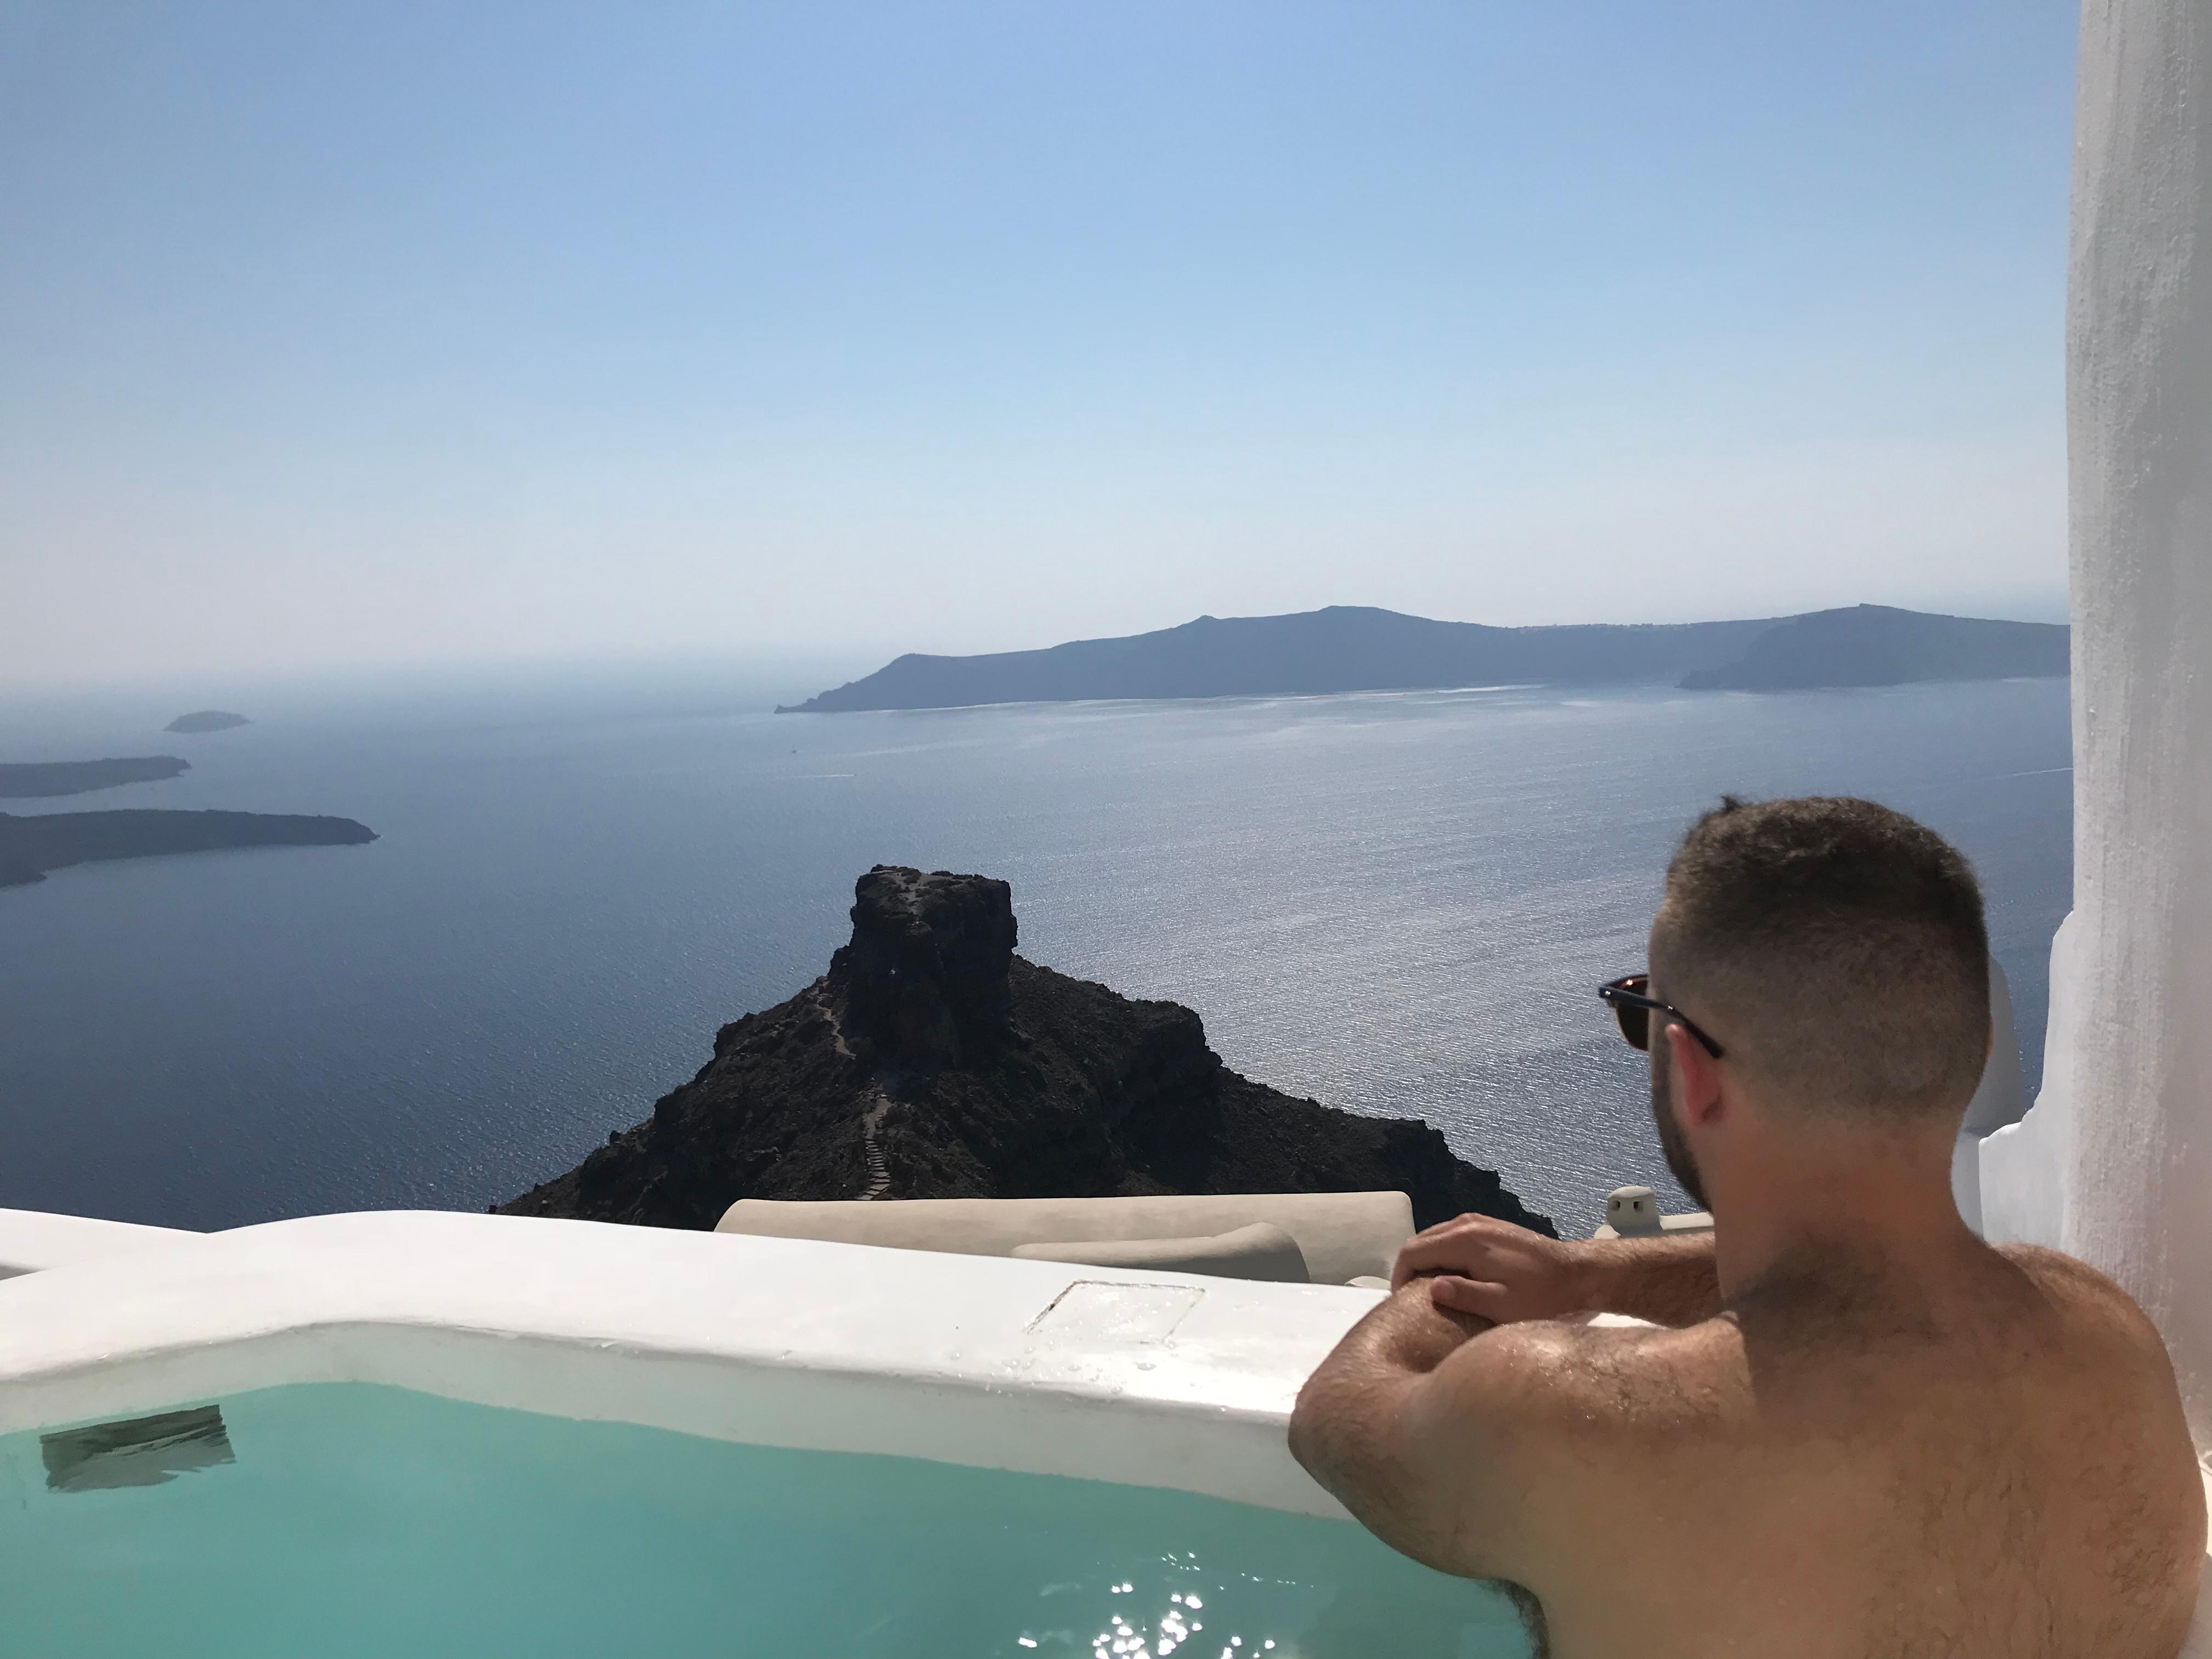 Sophia Suites Santorini : Sophia luxury suites santorin hotelbewertungen expedia